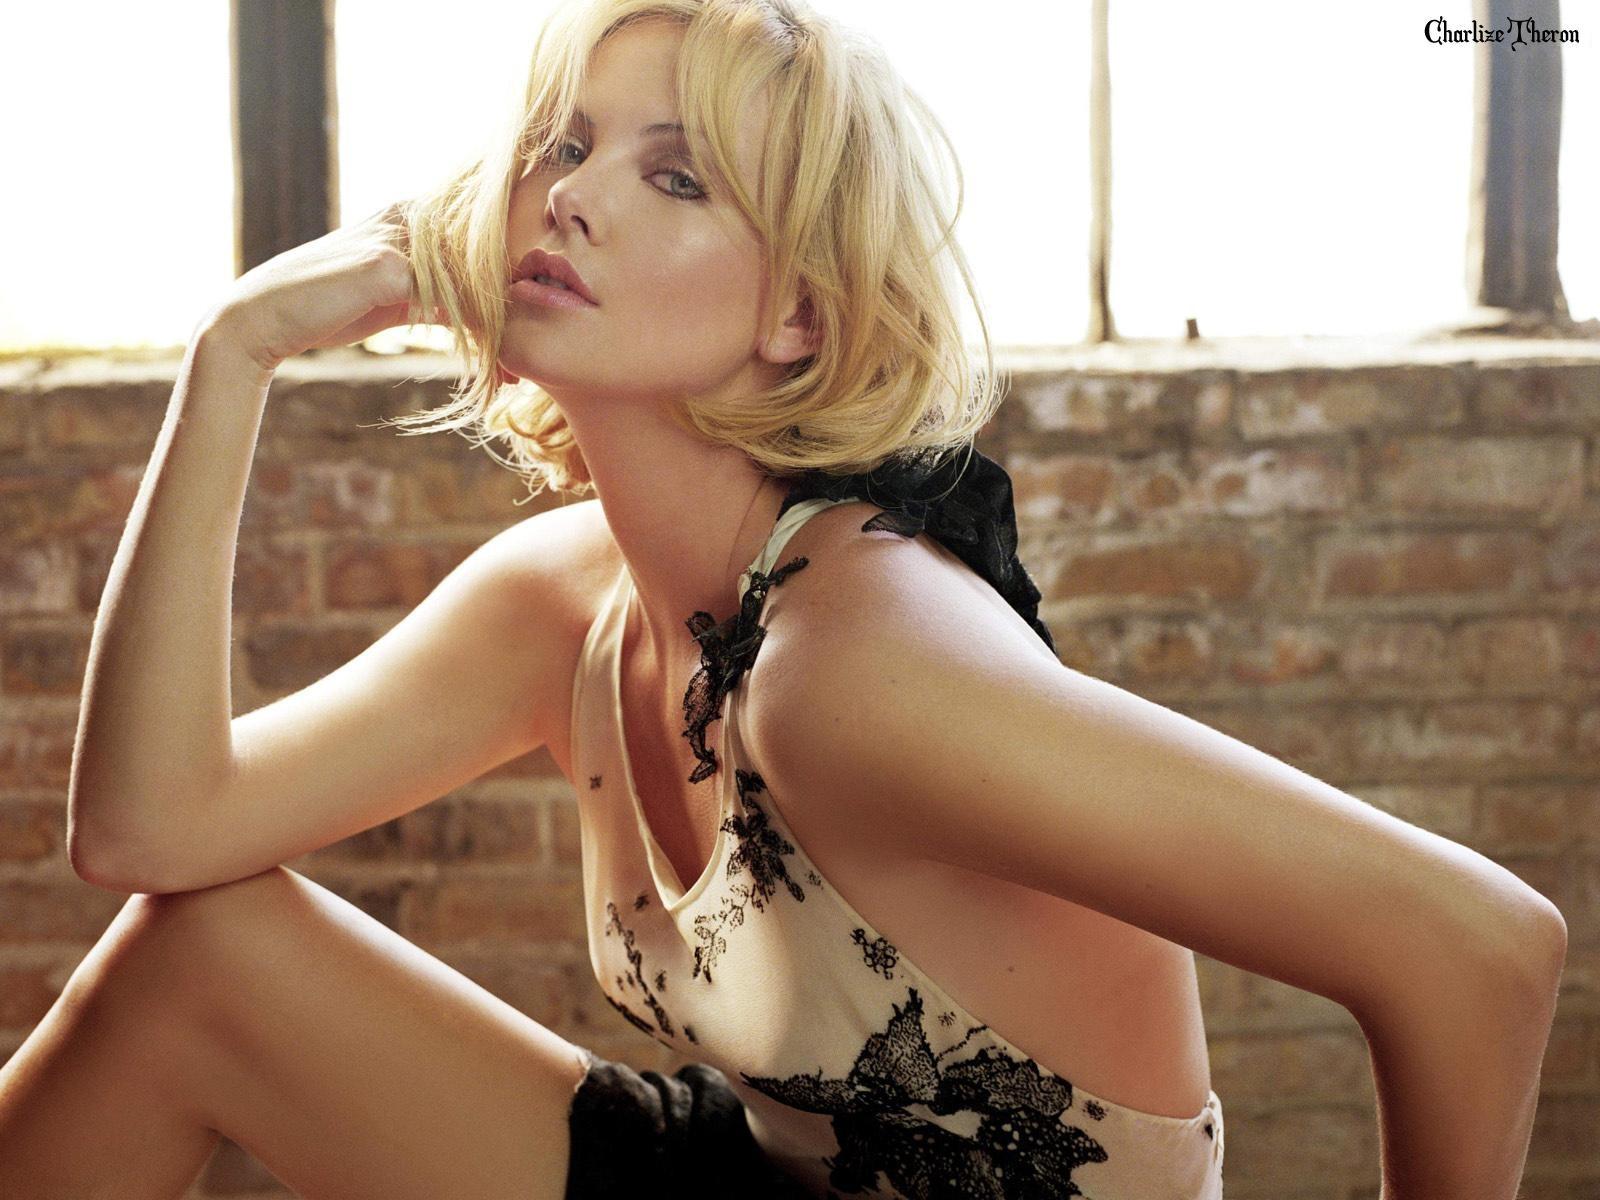 Charlize theron fotos